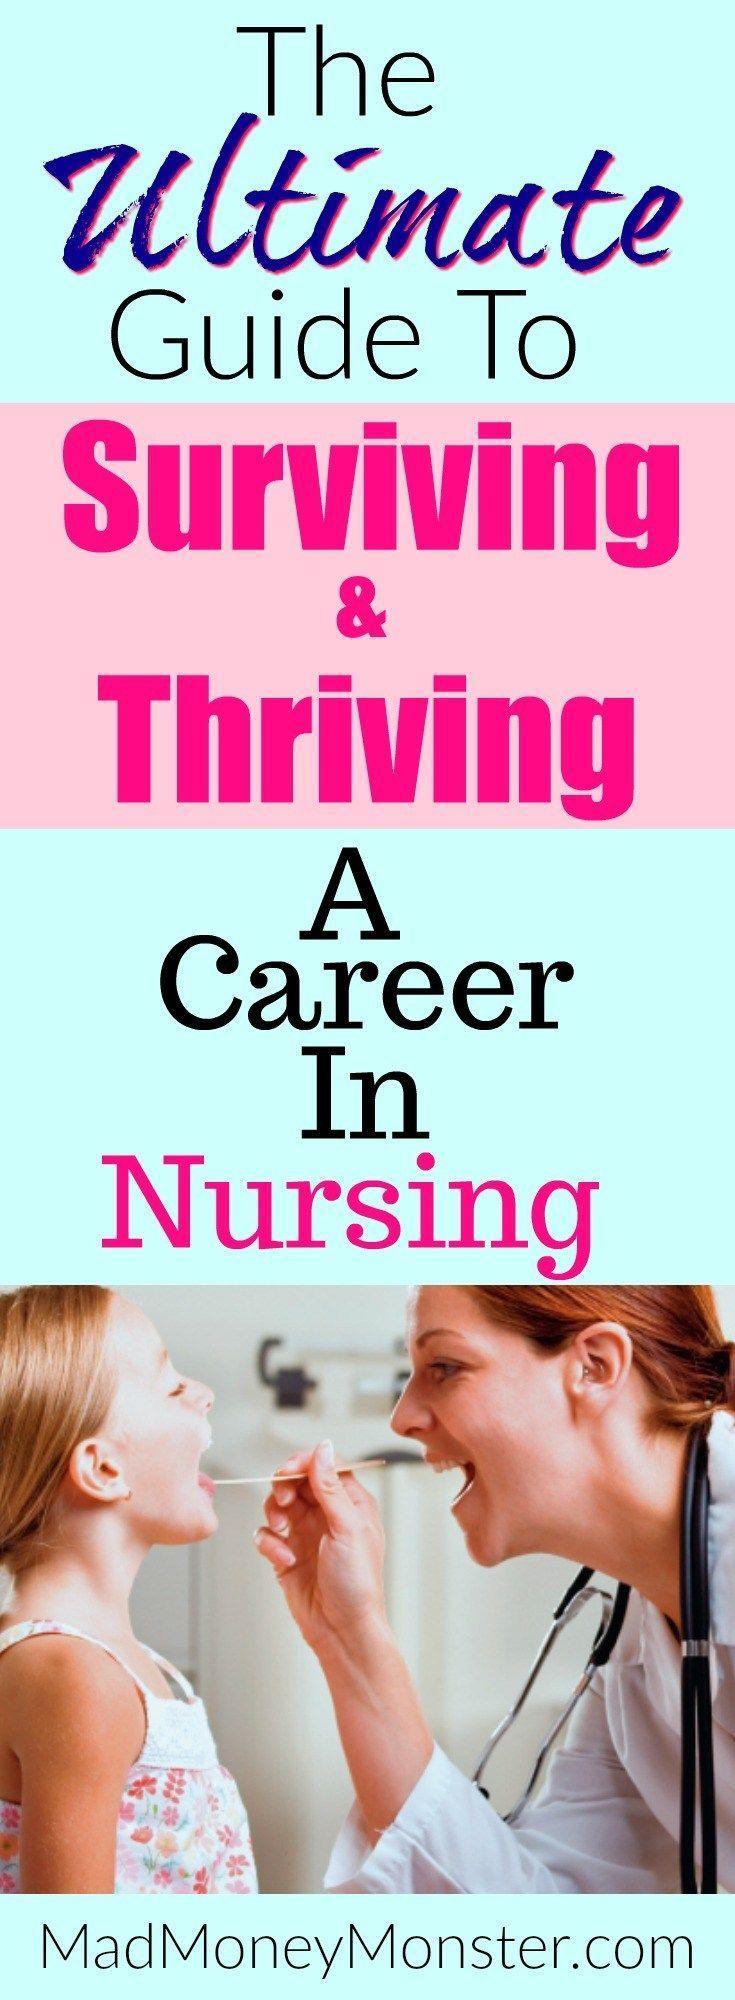 Nursing School   Careers In Nursing   Nursing Career   Nursing Survival Tips via @MadMoneyMonster